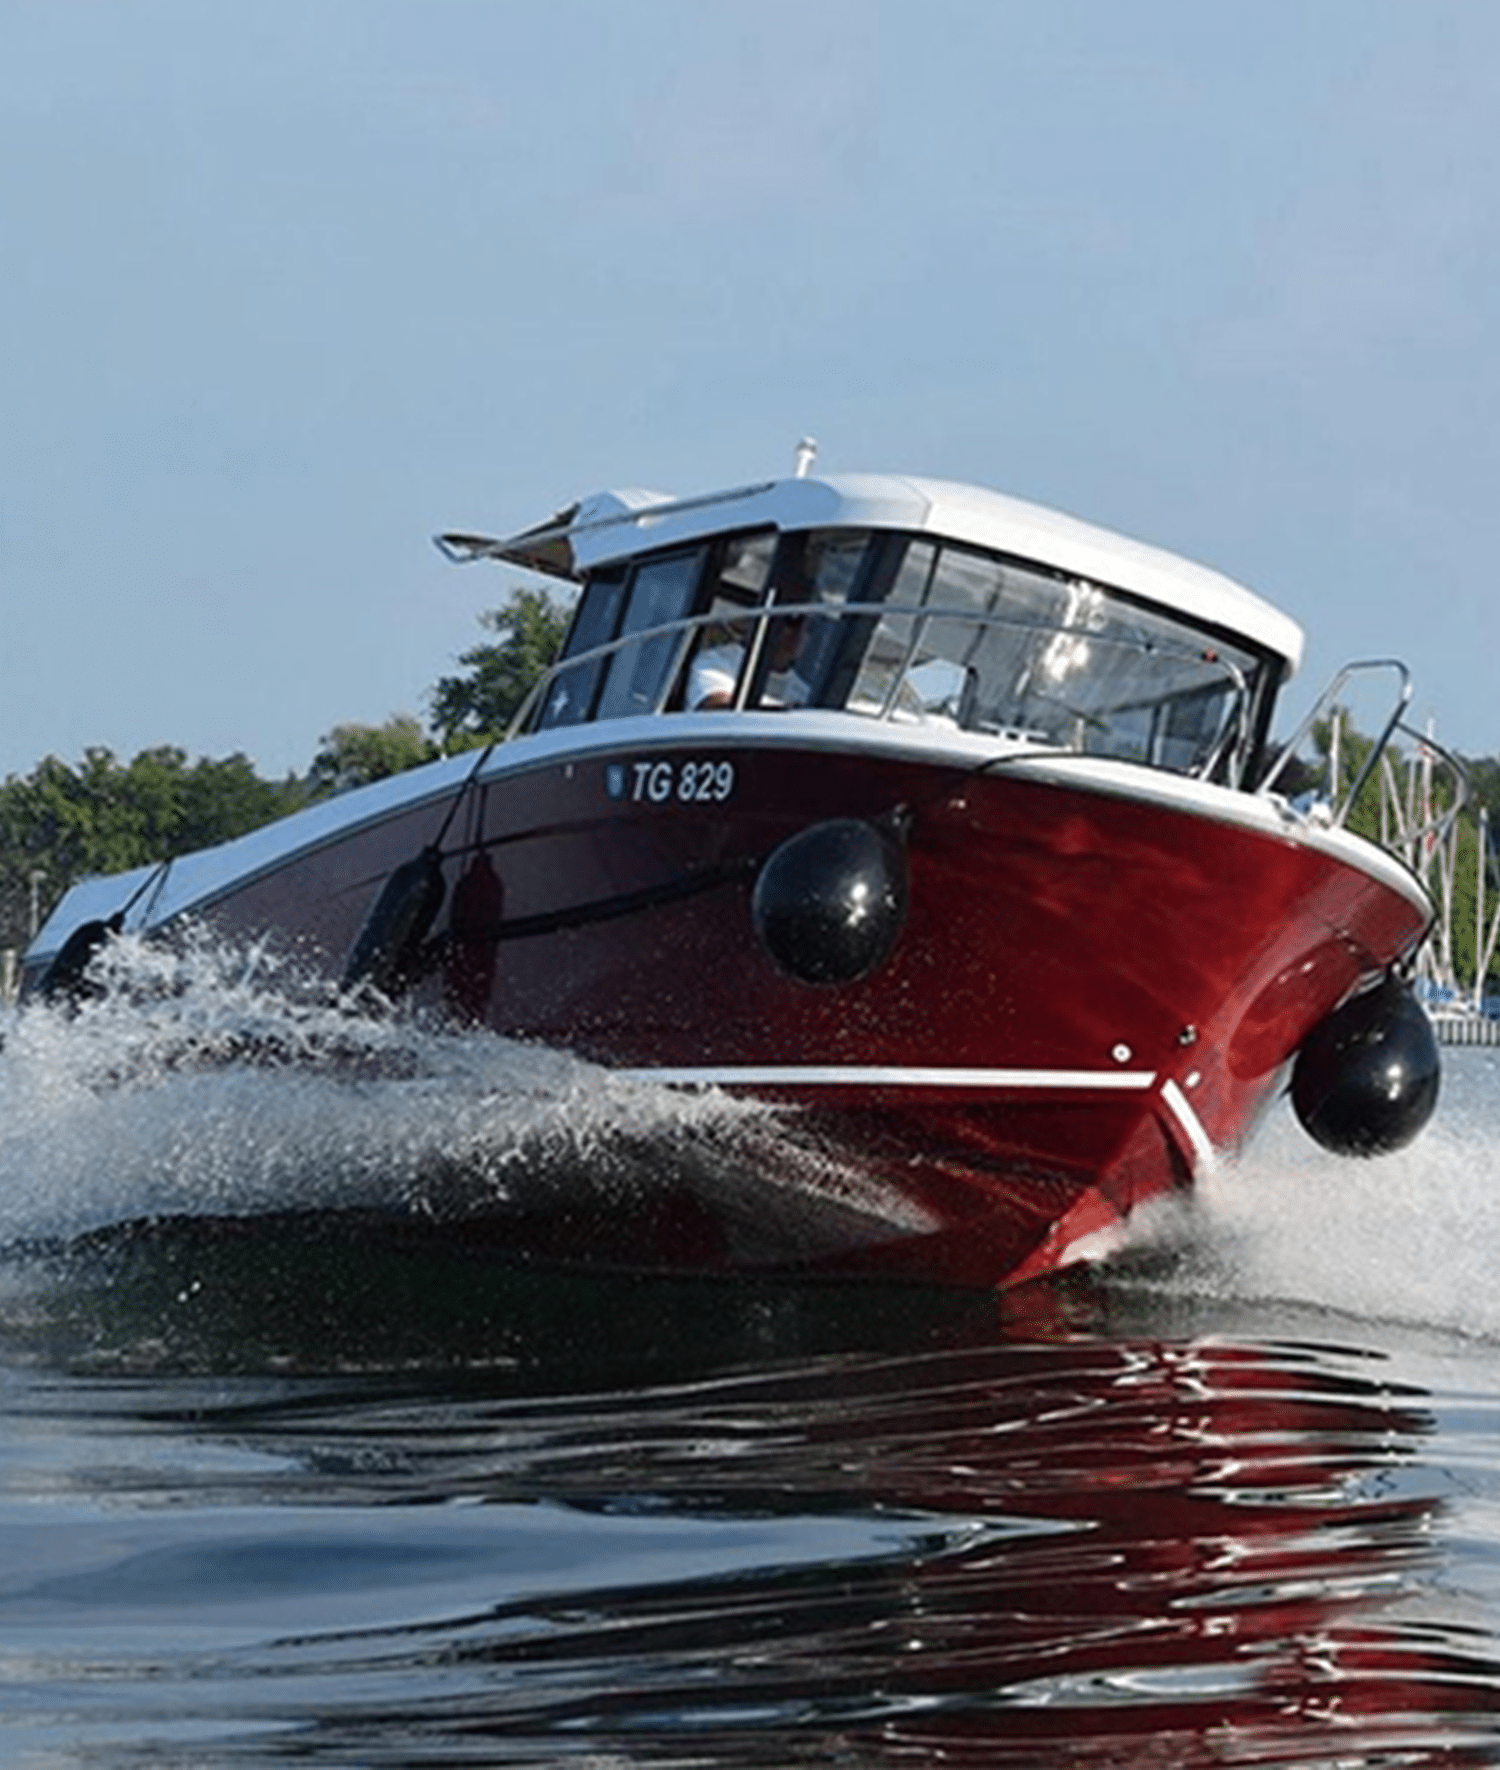 قایق-&-فروش-قایق&مارینا-کیش7ماریناکاسپین&مکیندریا&مکین-دریا-کاسپین